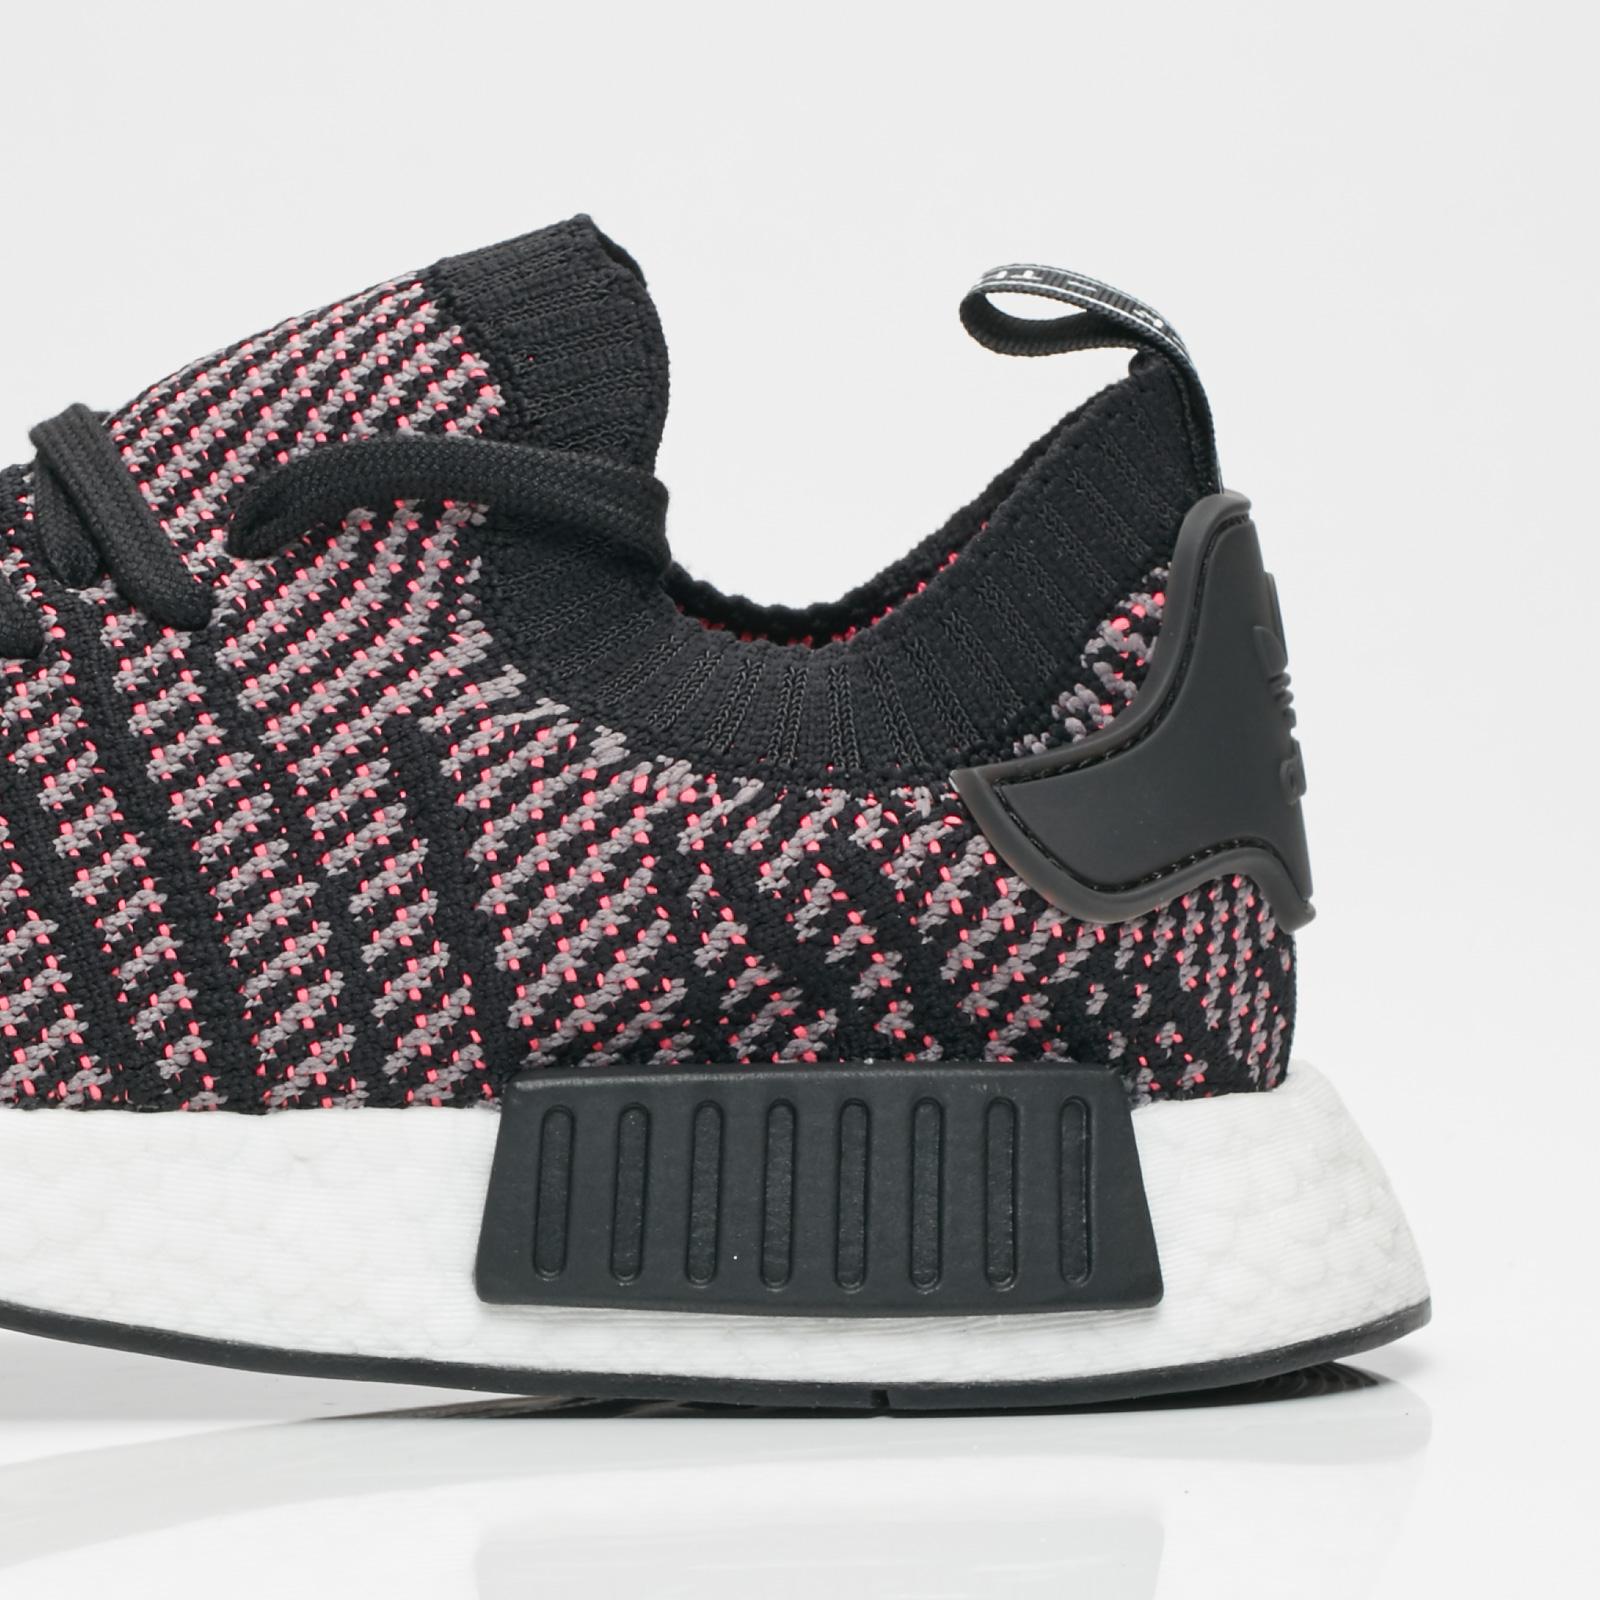 Adidas Nmd R1 Stlt Primeknit Cq2386 Sneakersnstuff Sneaker